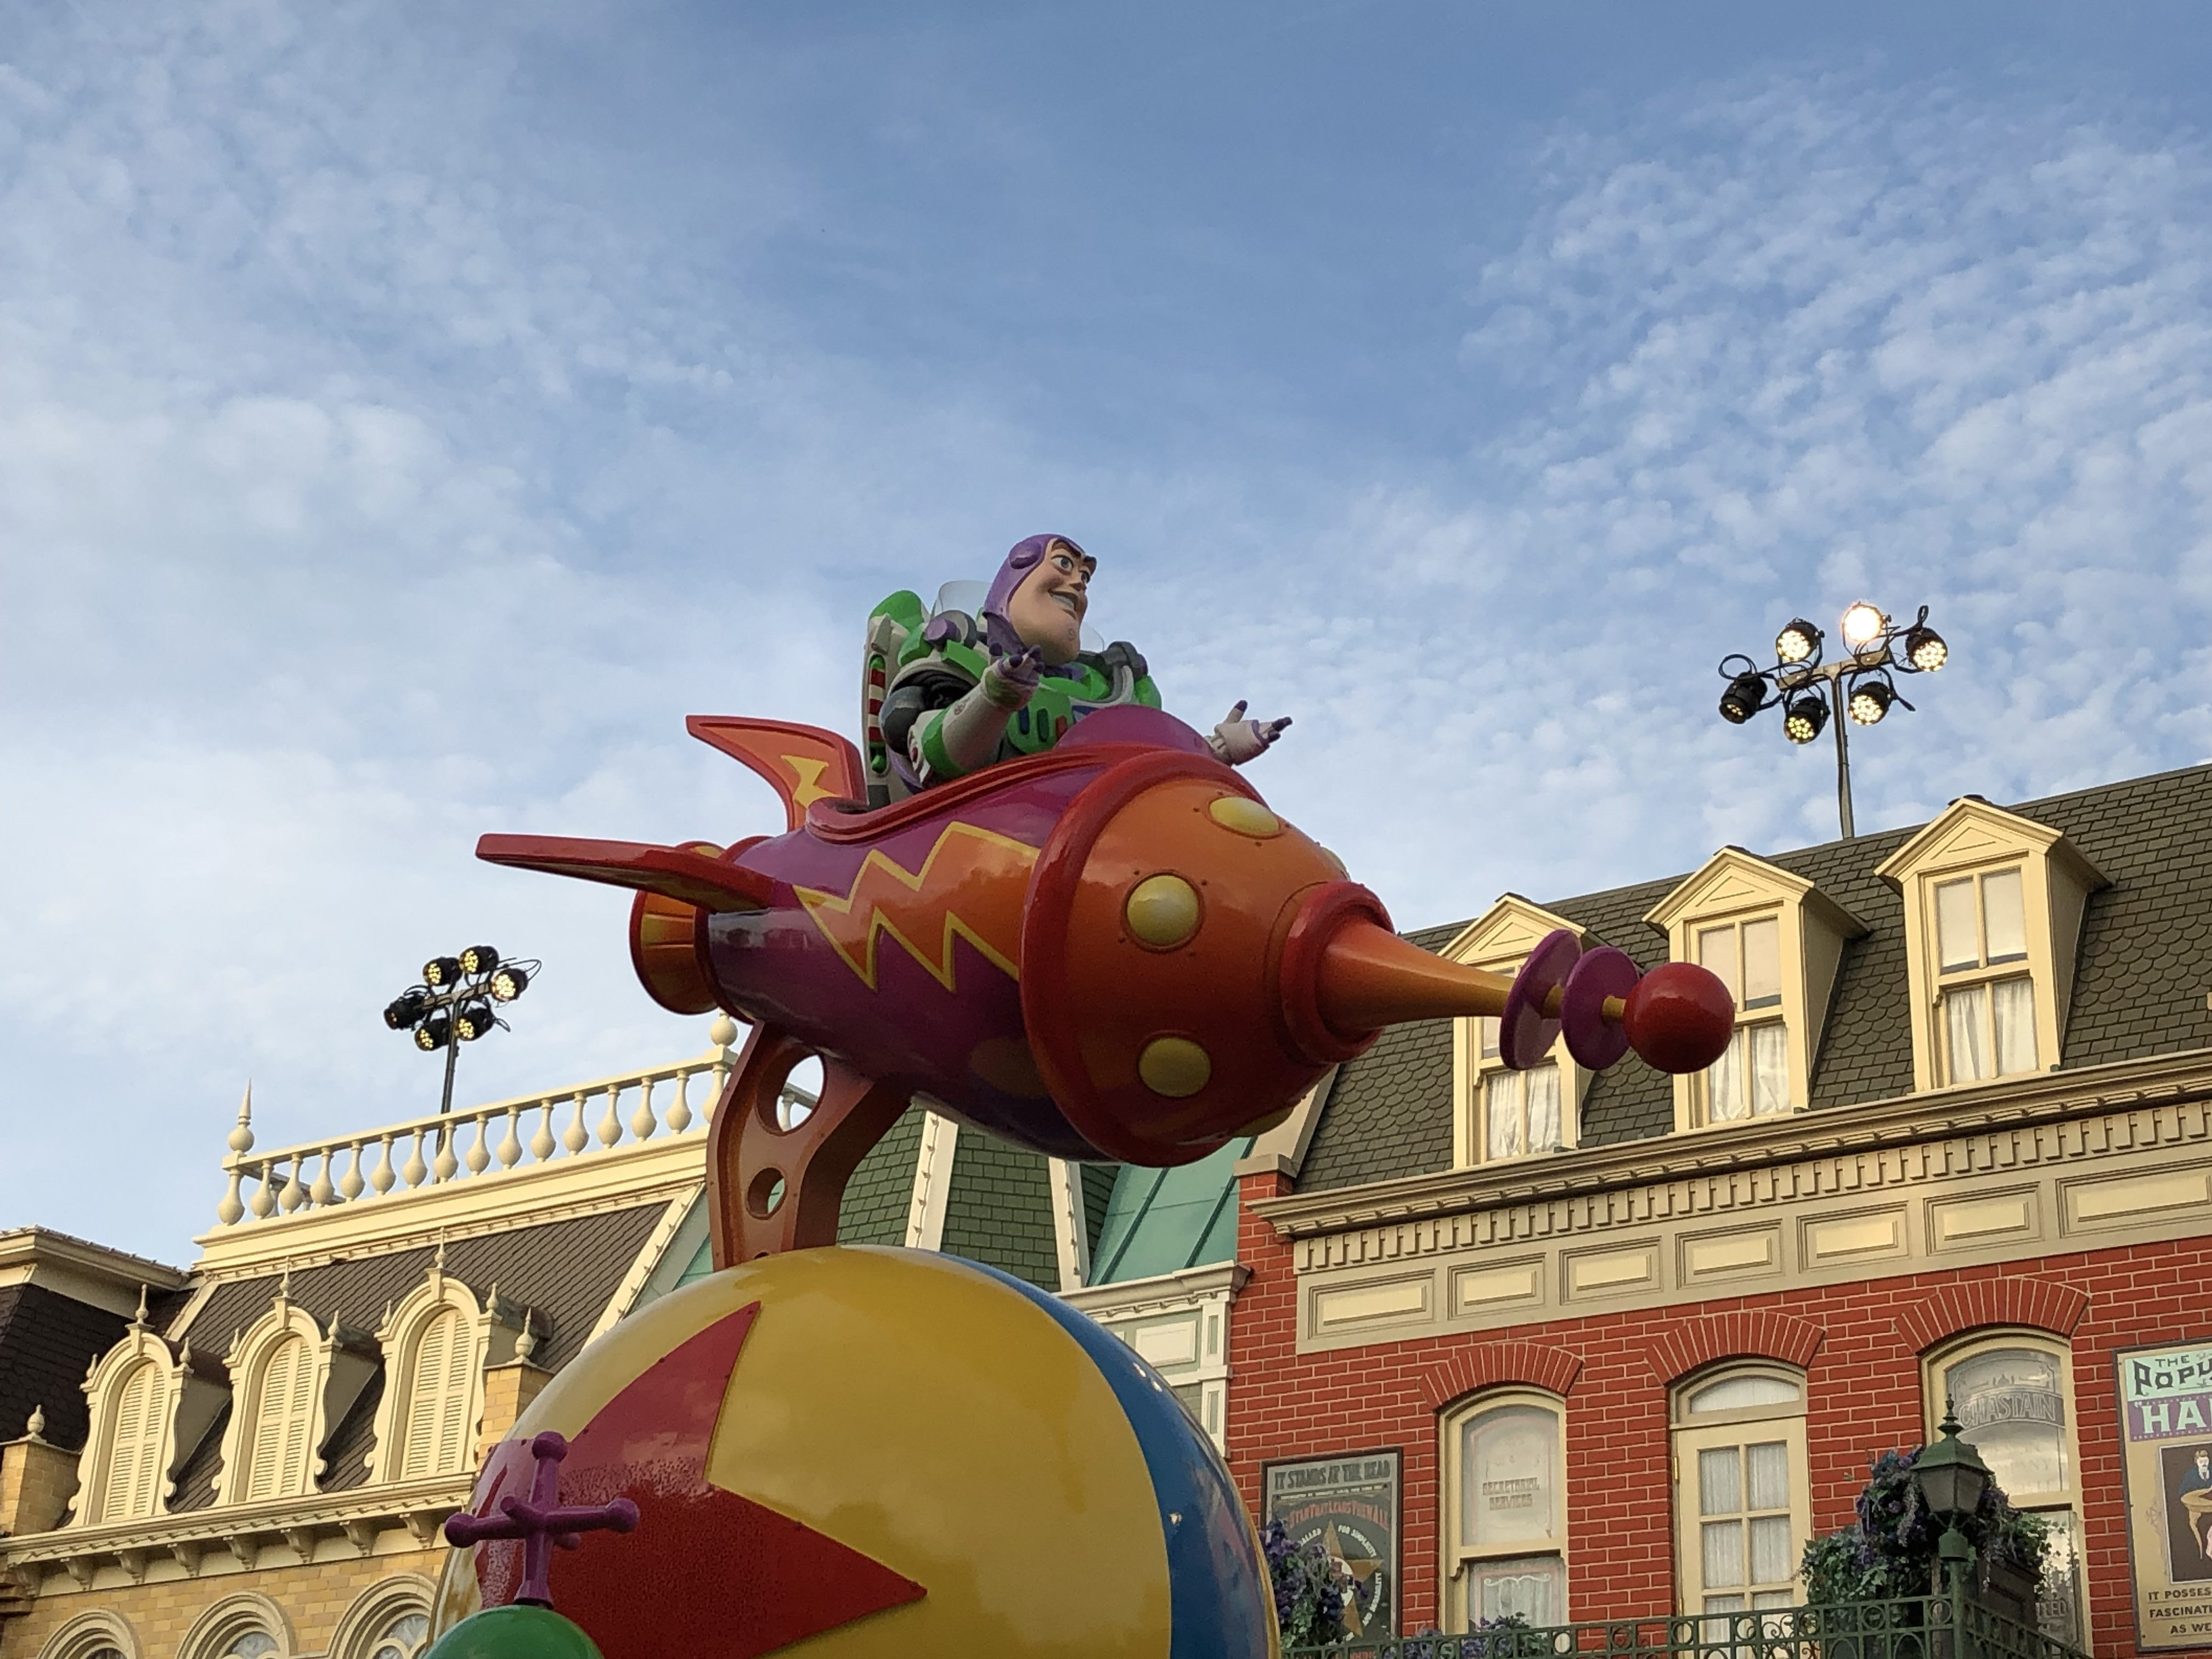 Disneyland: Disney Parade Toy Story